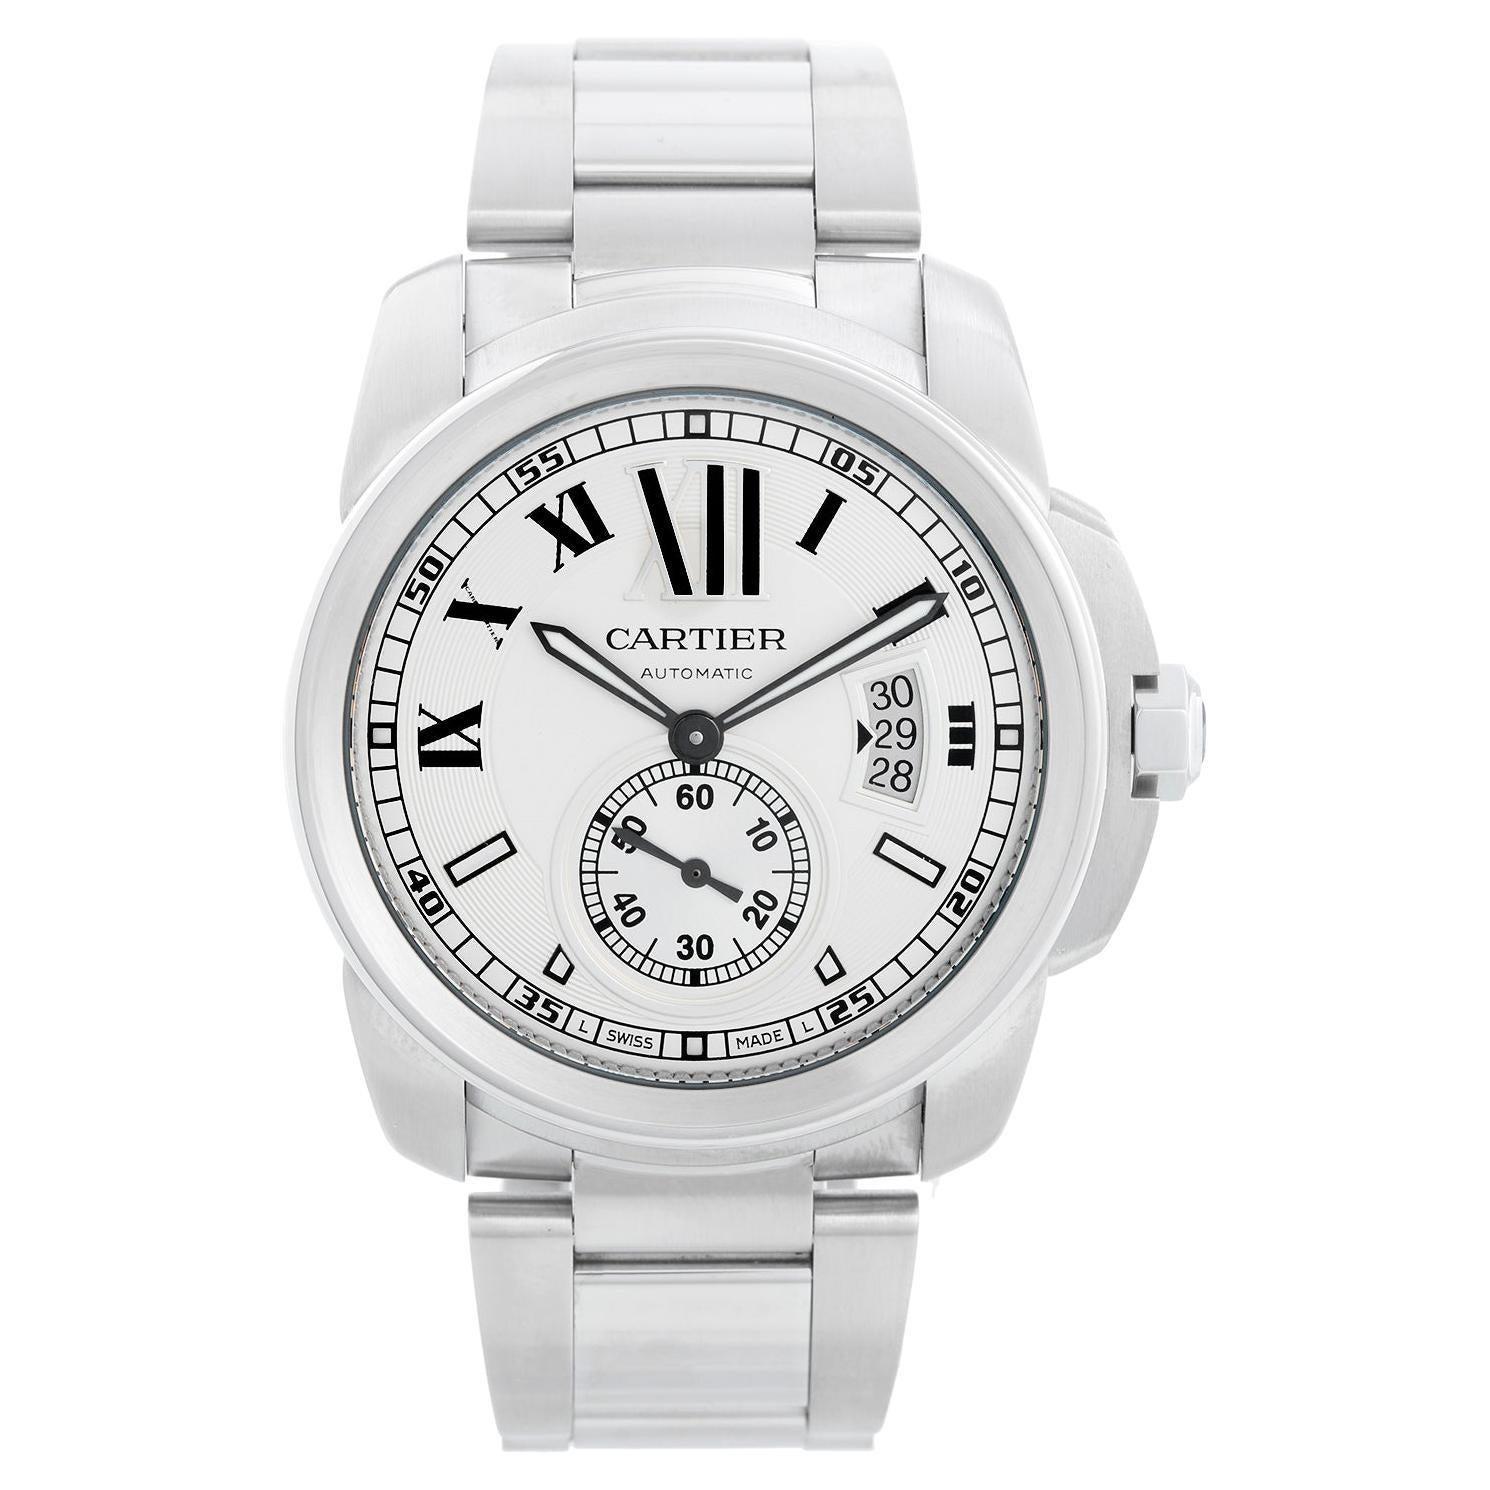 Cartier Calibre Stainless Steel Men's Watch W7100015